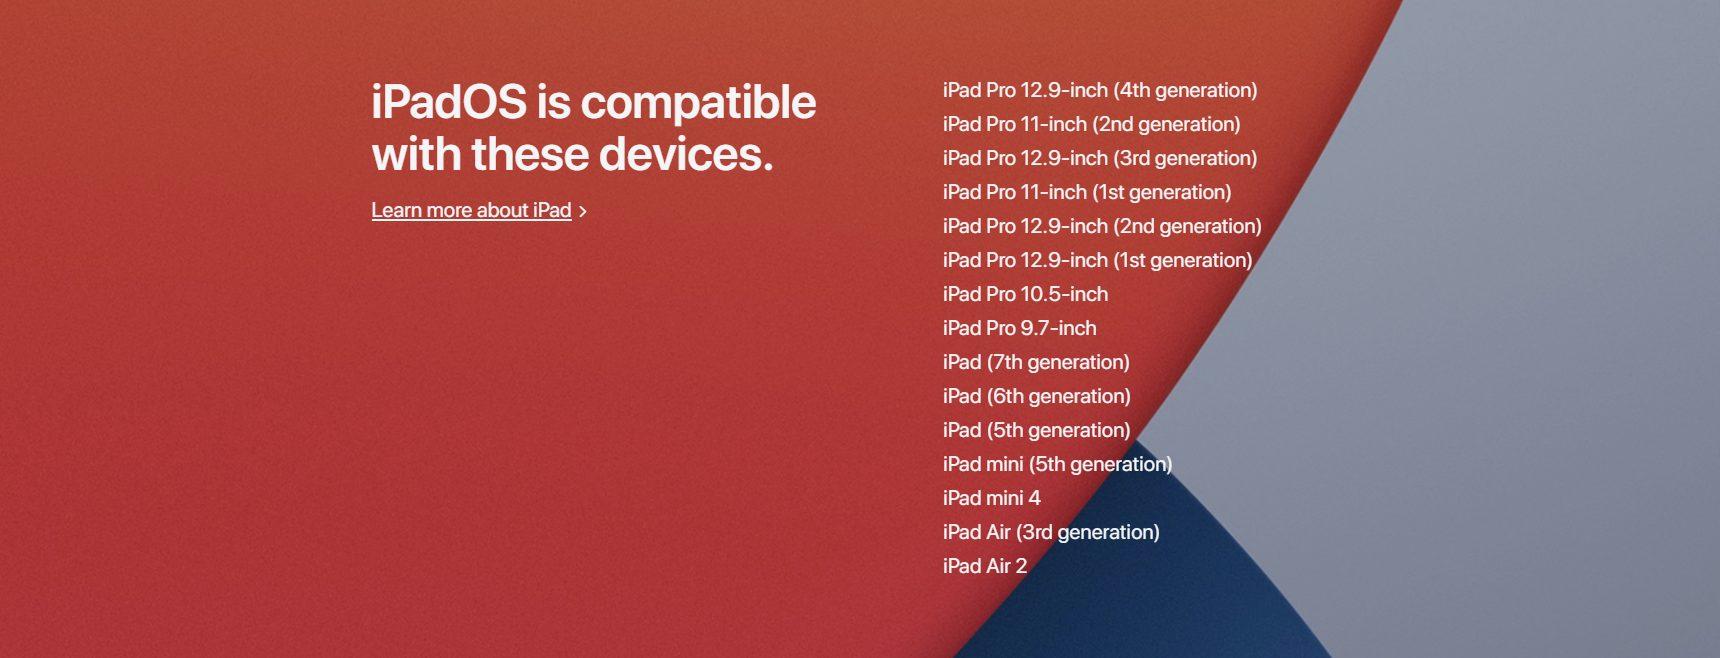 iPadsOS compatibility